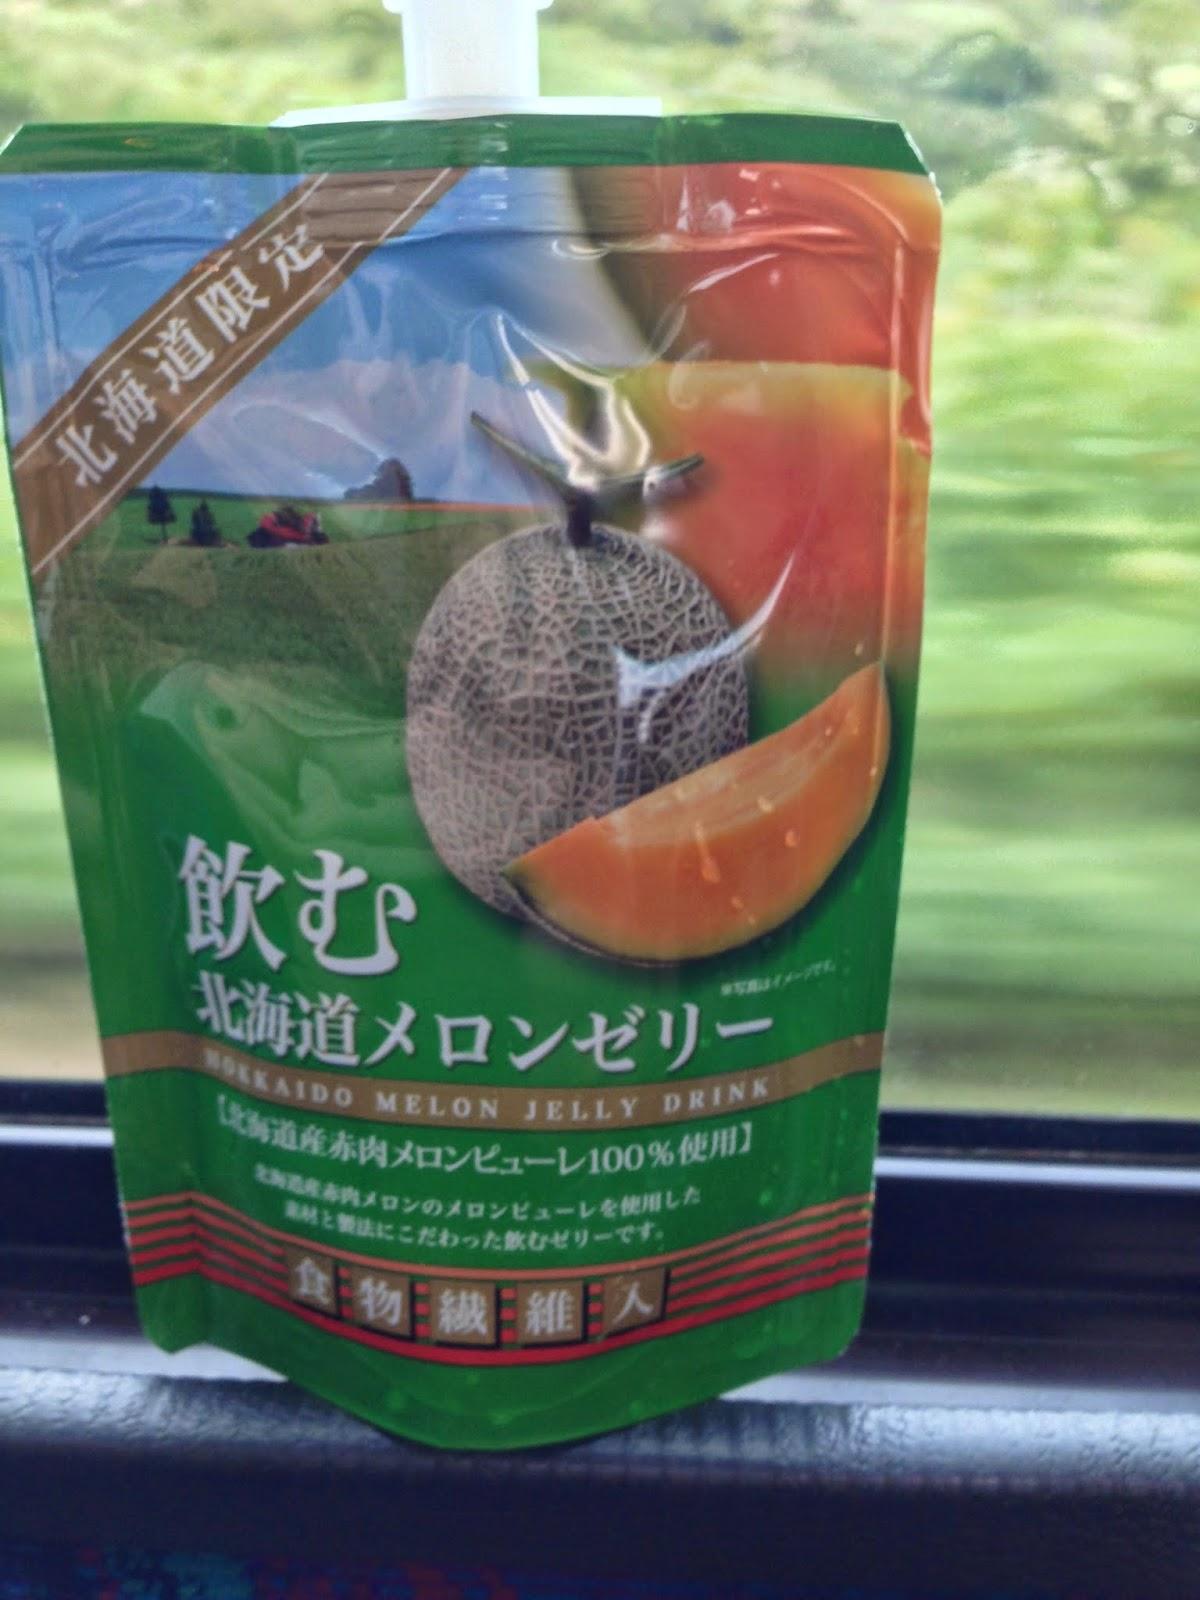 Hokkaido Melon Jelly Drink